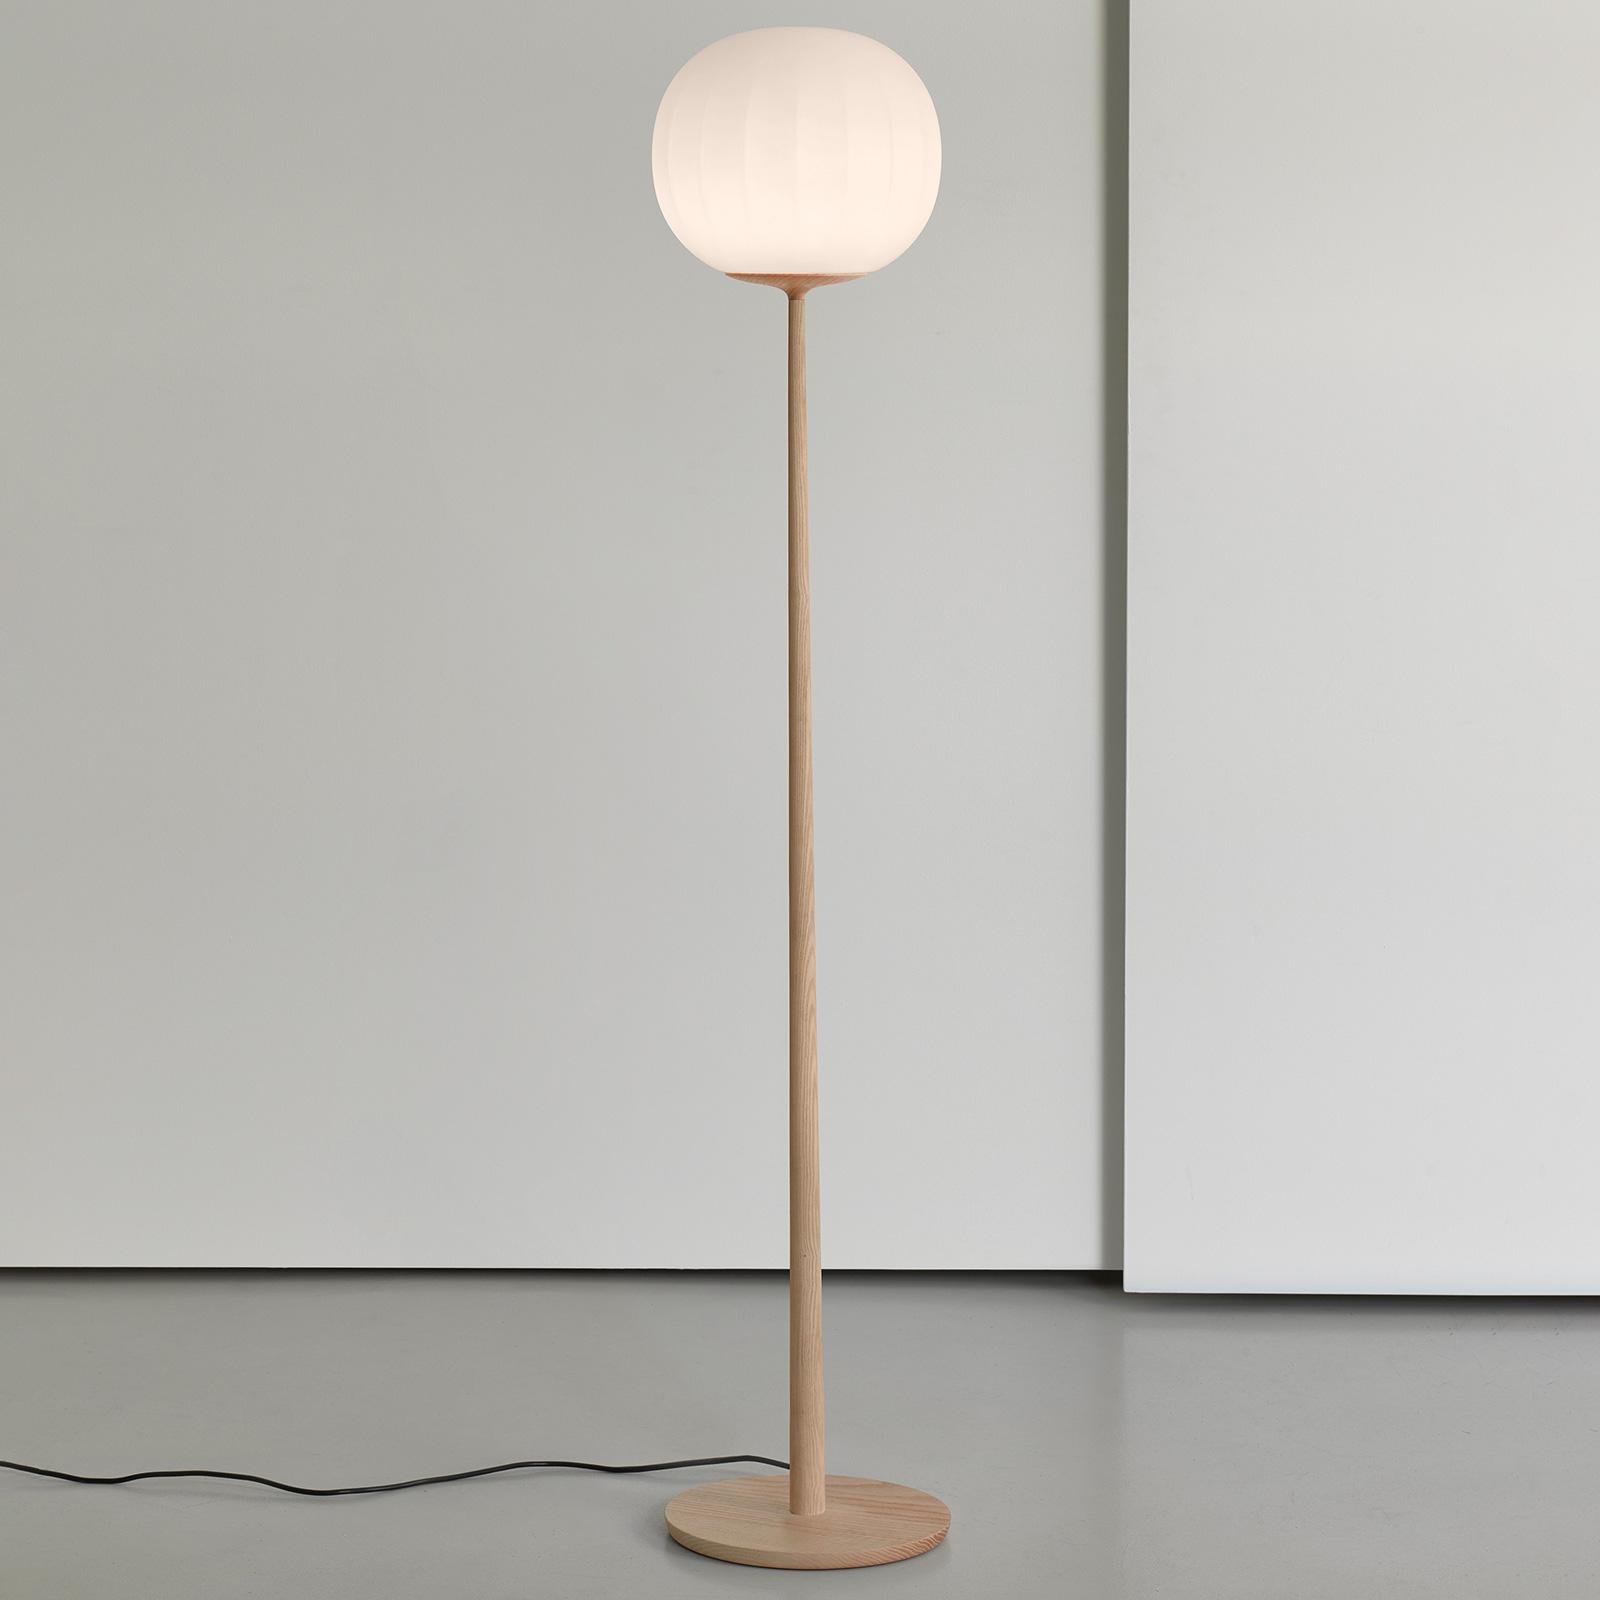 Luceplan Lita lampa stojąca klosz 42 cm, jesion